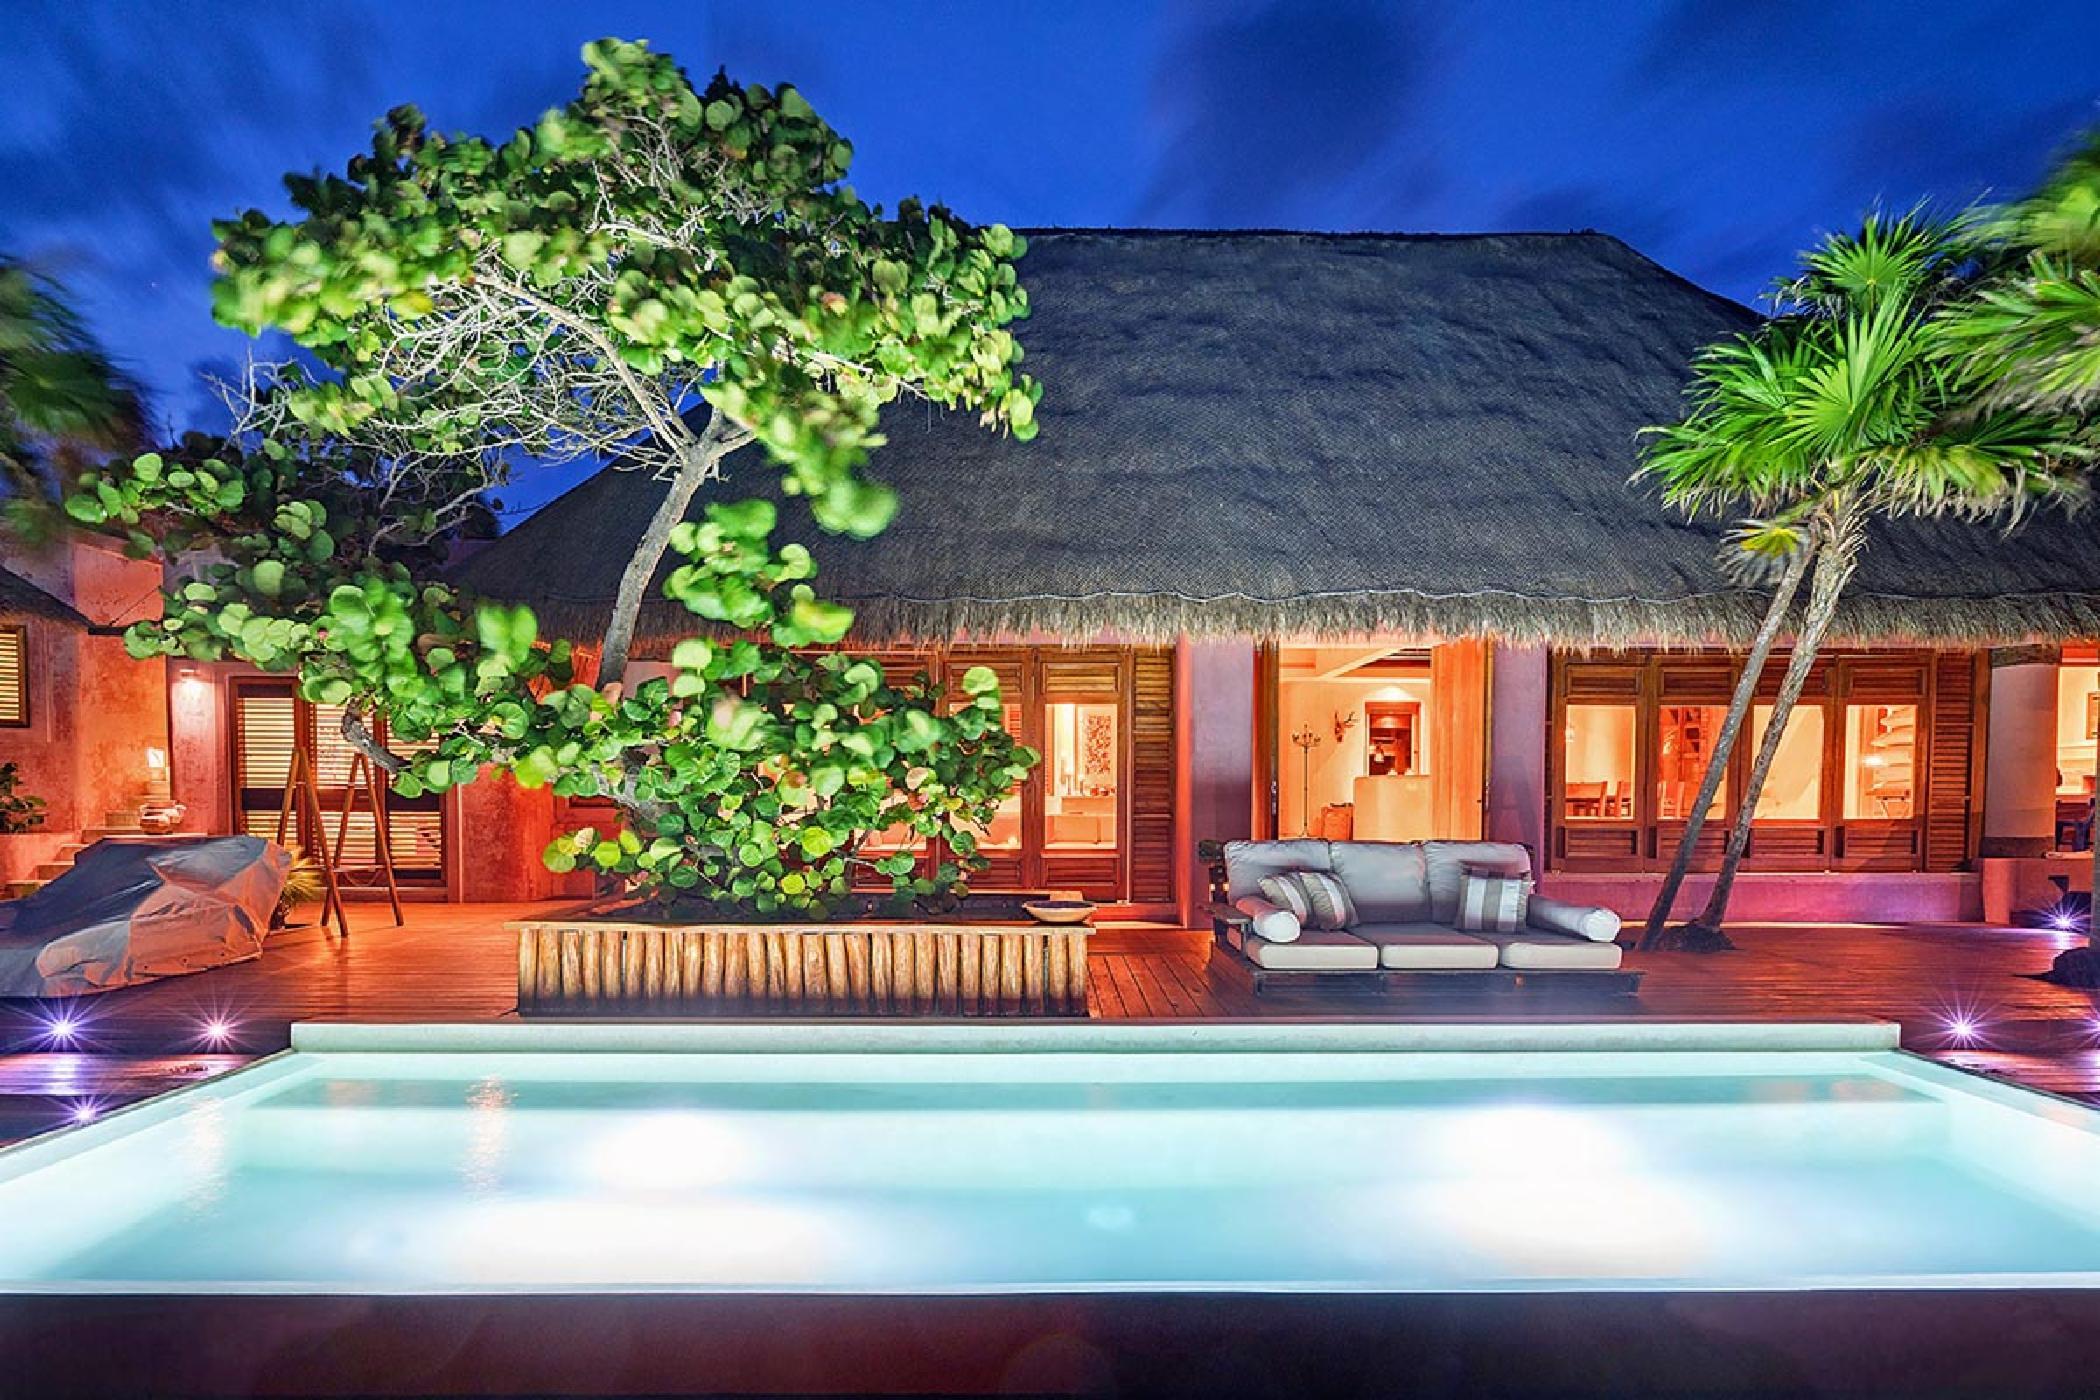 Maya_Luxe_Riviera_Maya_Luxury_Villas_Experiences_Sian_Kaan_Tulum_4_Bedrooms_Casa_Cantarena_31.jpg